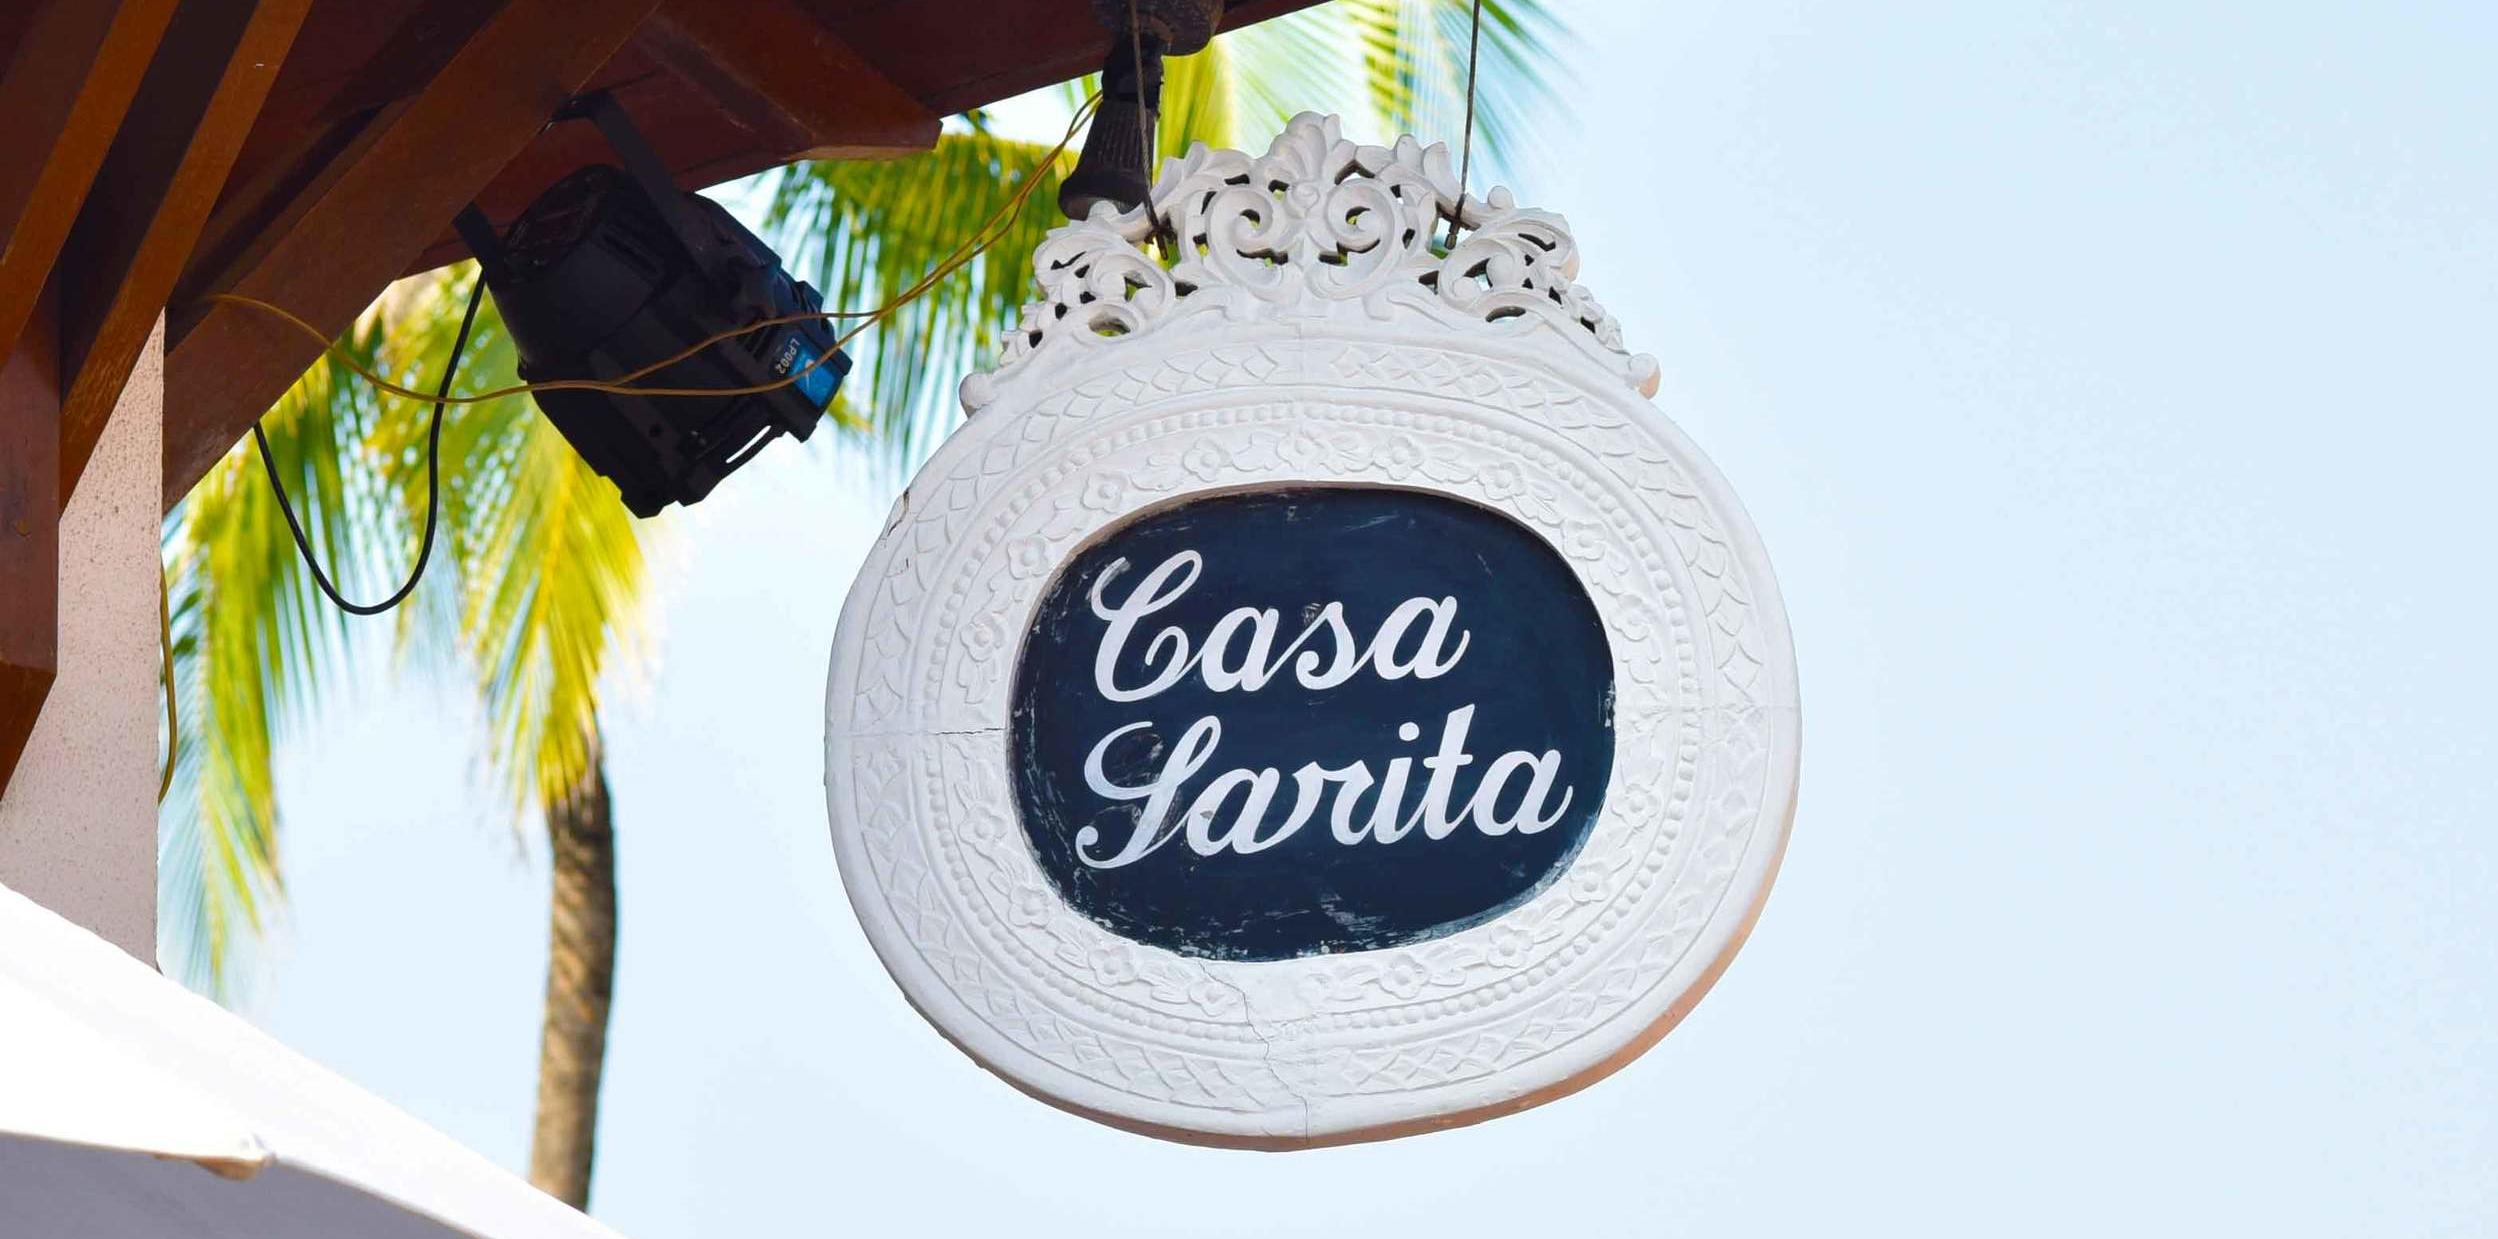 Case Sarita for Goan cuisine, Park Hyatt Hotel, Goa. Image©sourcingstyle.com.